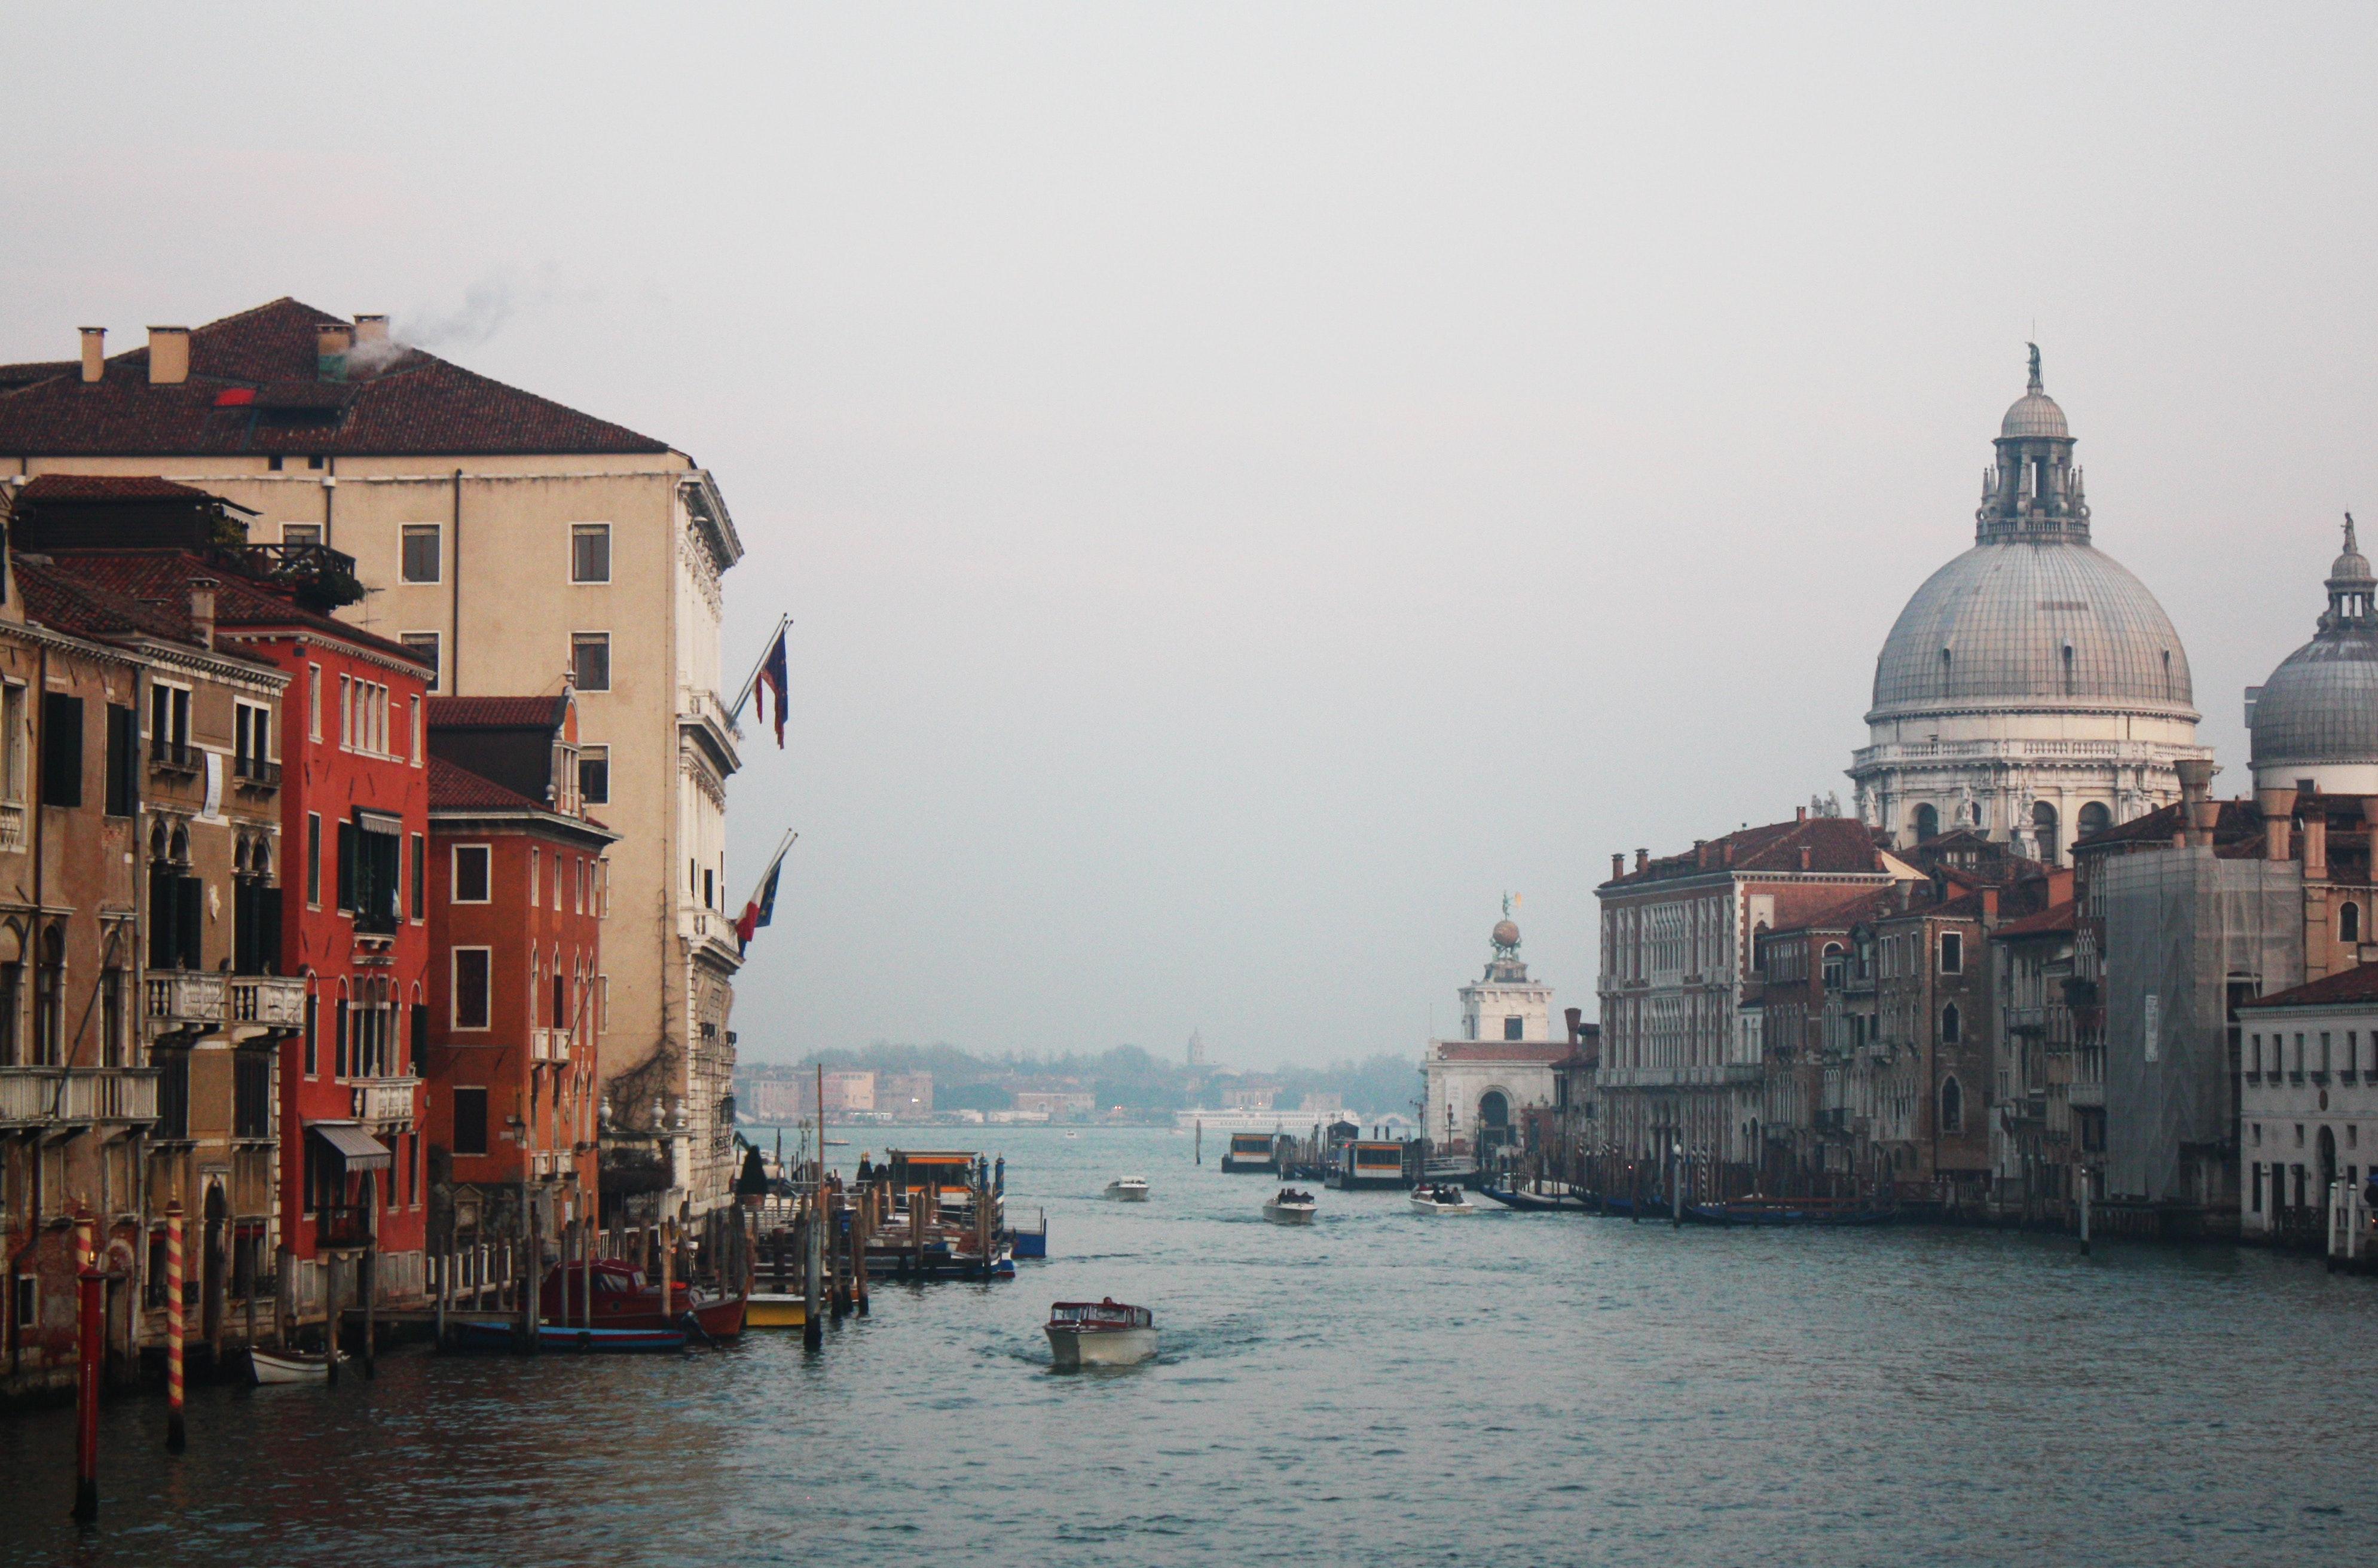 White Motor Boat on Ocean Beside Concrete Buildings, Architecture, Water, Venice, Venetian, HQ Photo